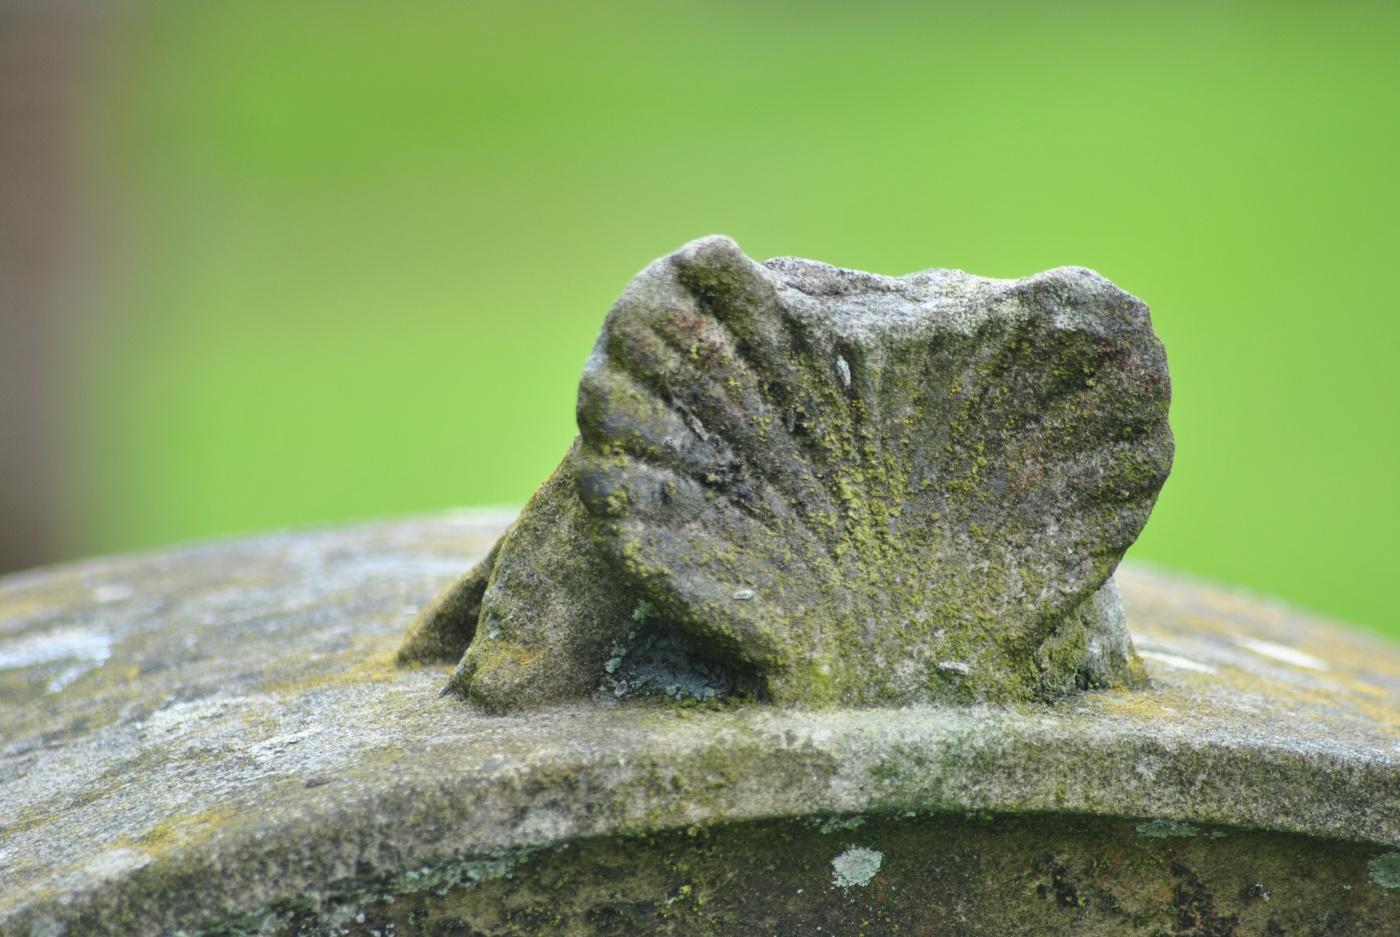 Graveyards of Scotland Muiravonhead Nellie Merthe Erkenbach graveyard symbols shell st James